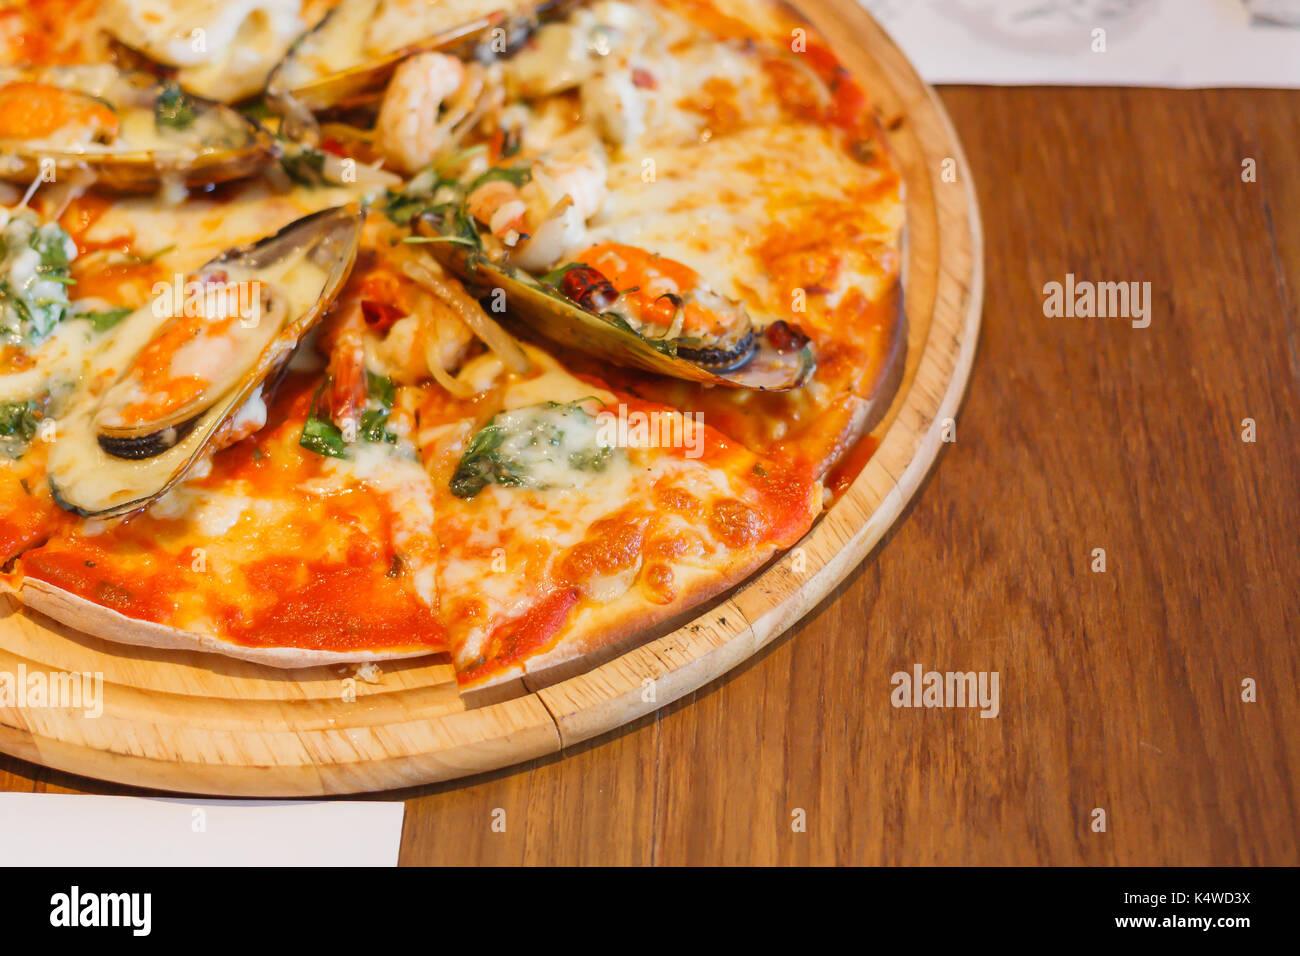 Pizza Restaurant Oven Stockfotos & Pizza Restaurant Oven Bilder - Alamy